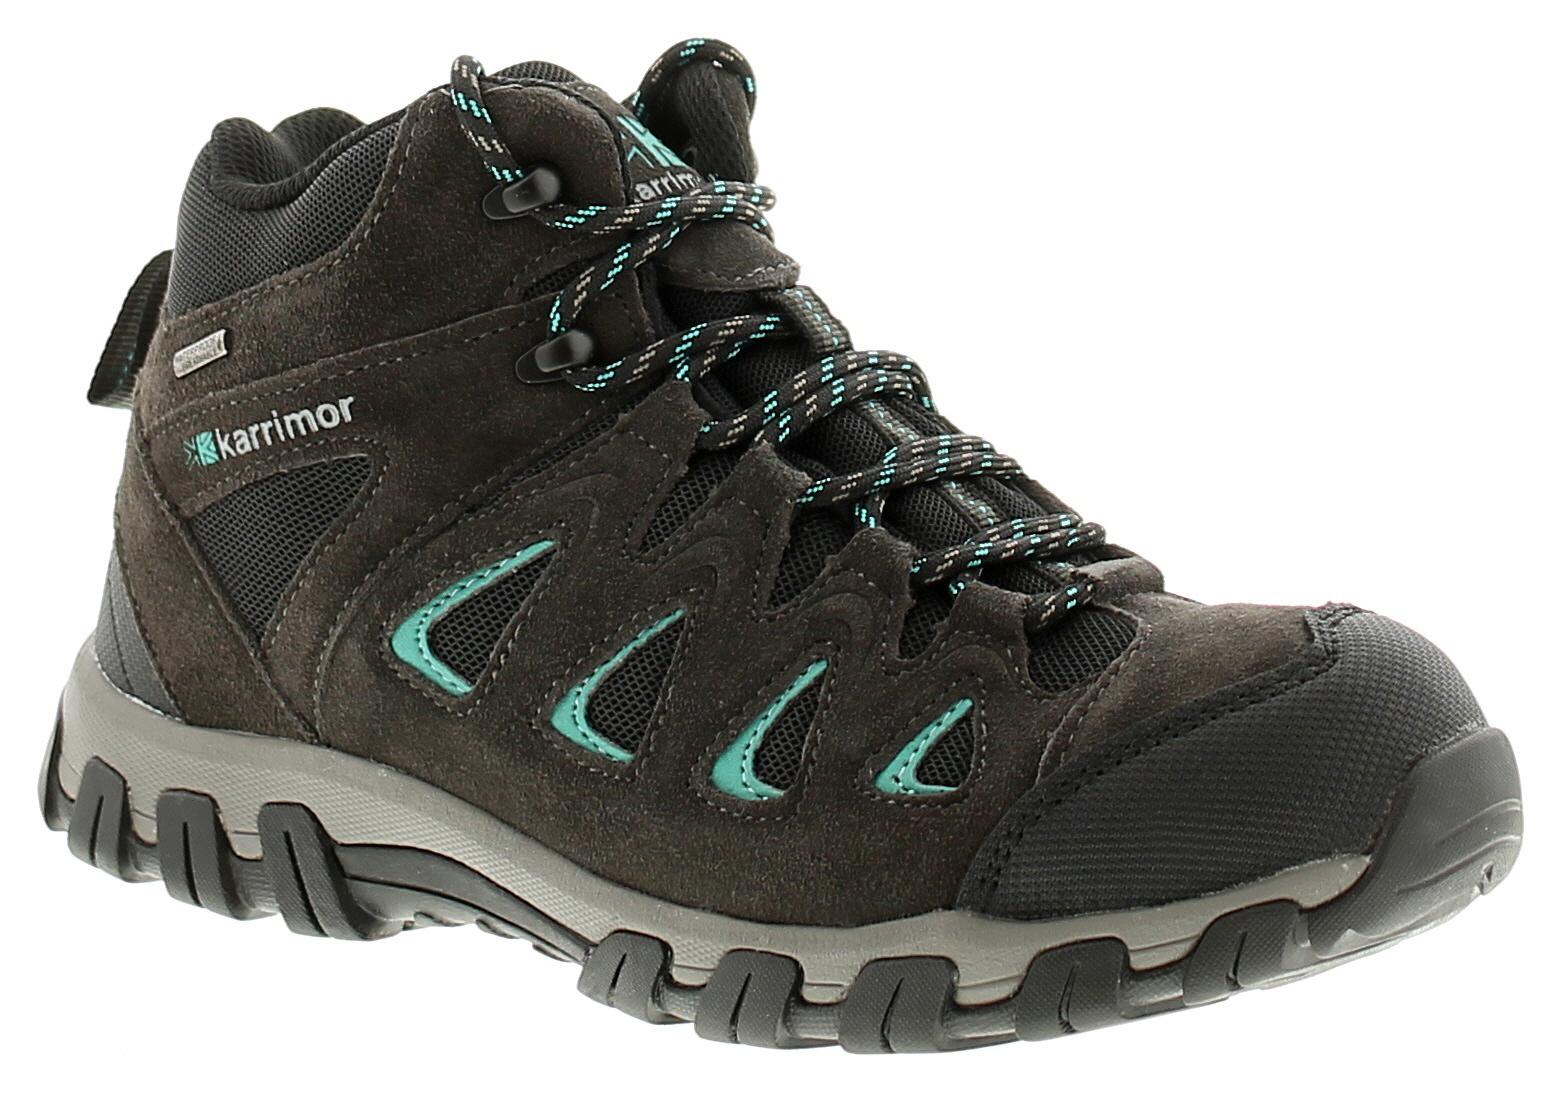 Ladies Womens Walking Boots Hinkin Trek